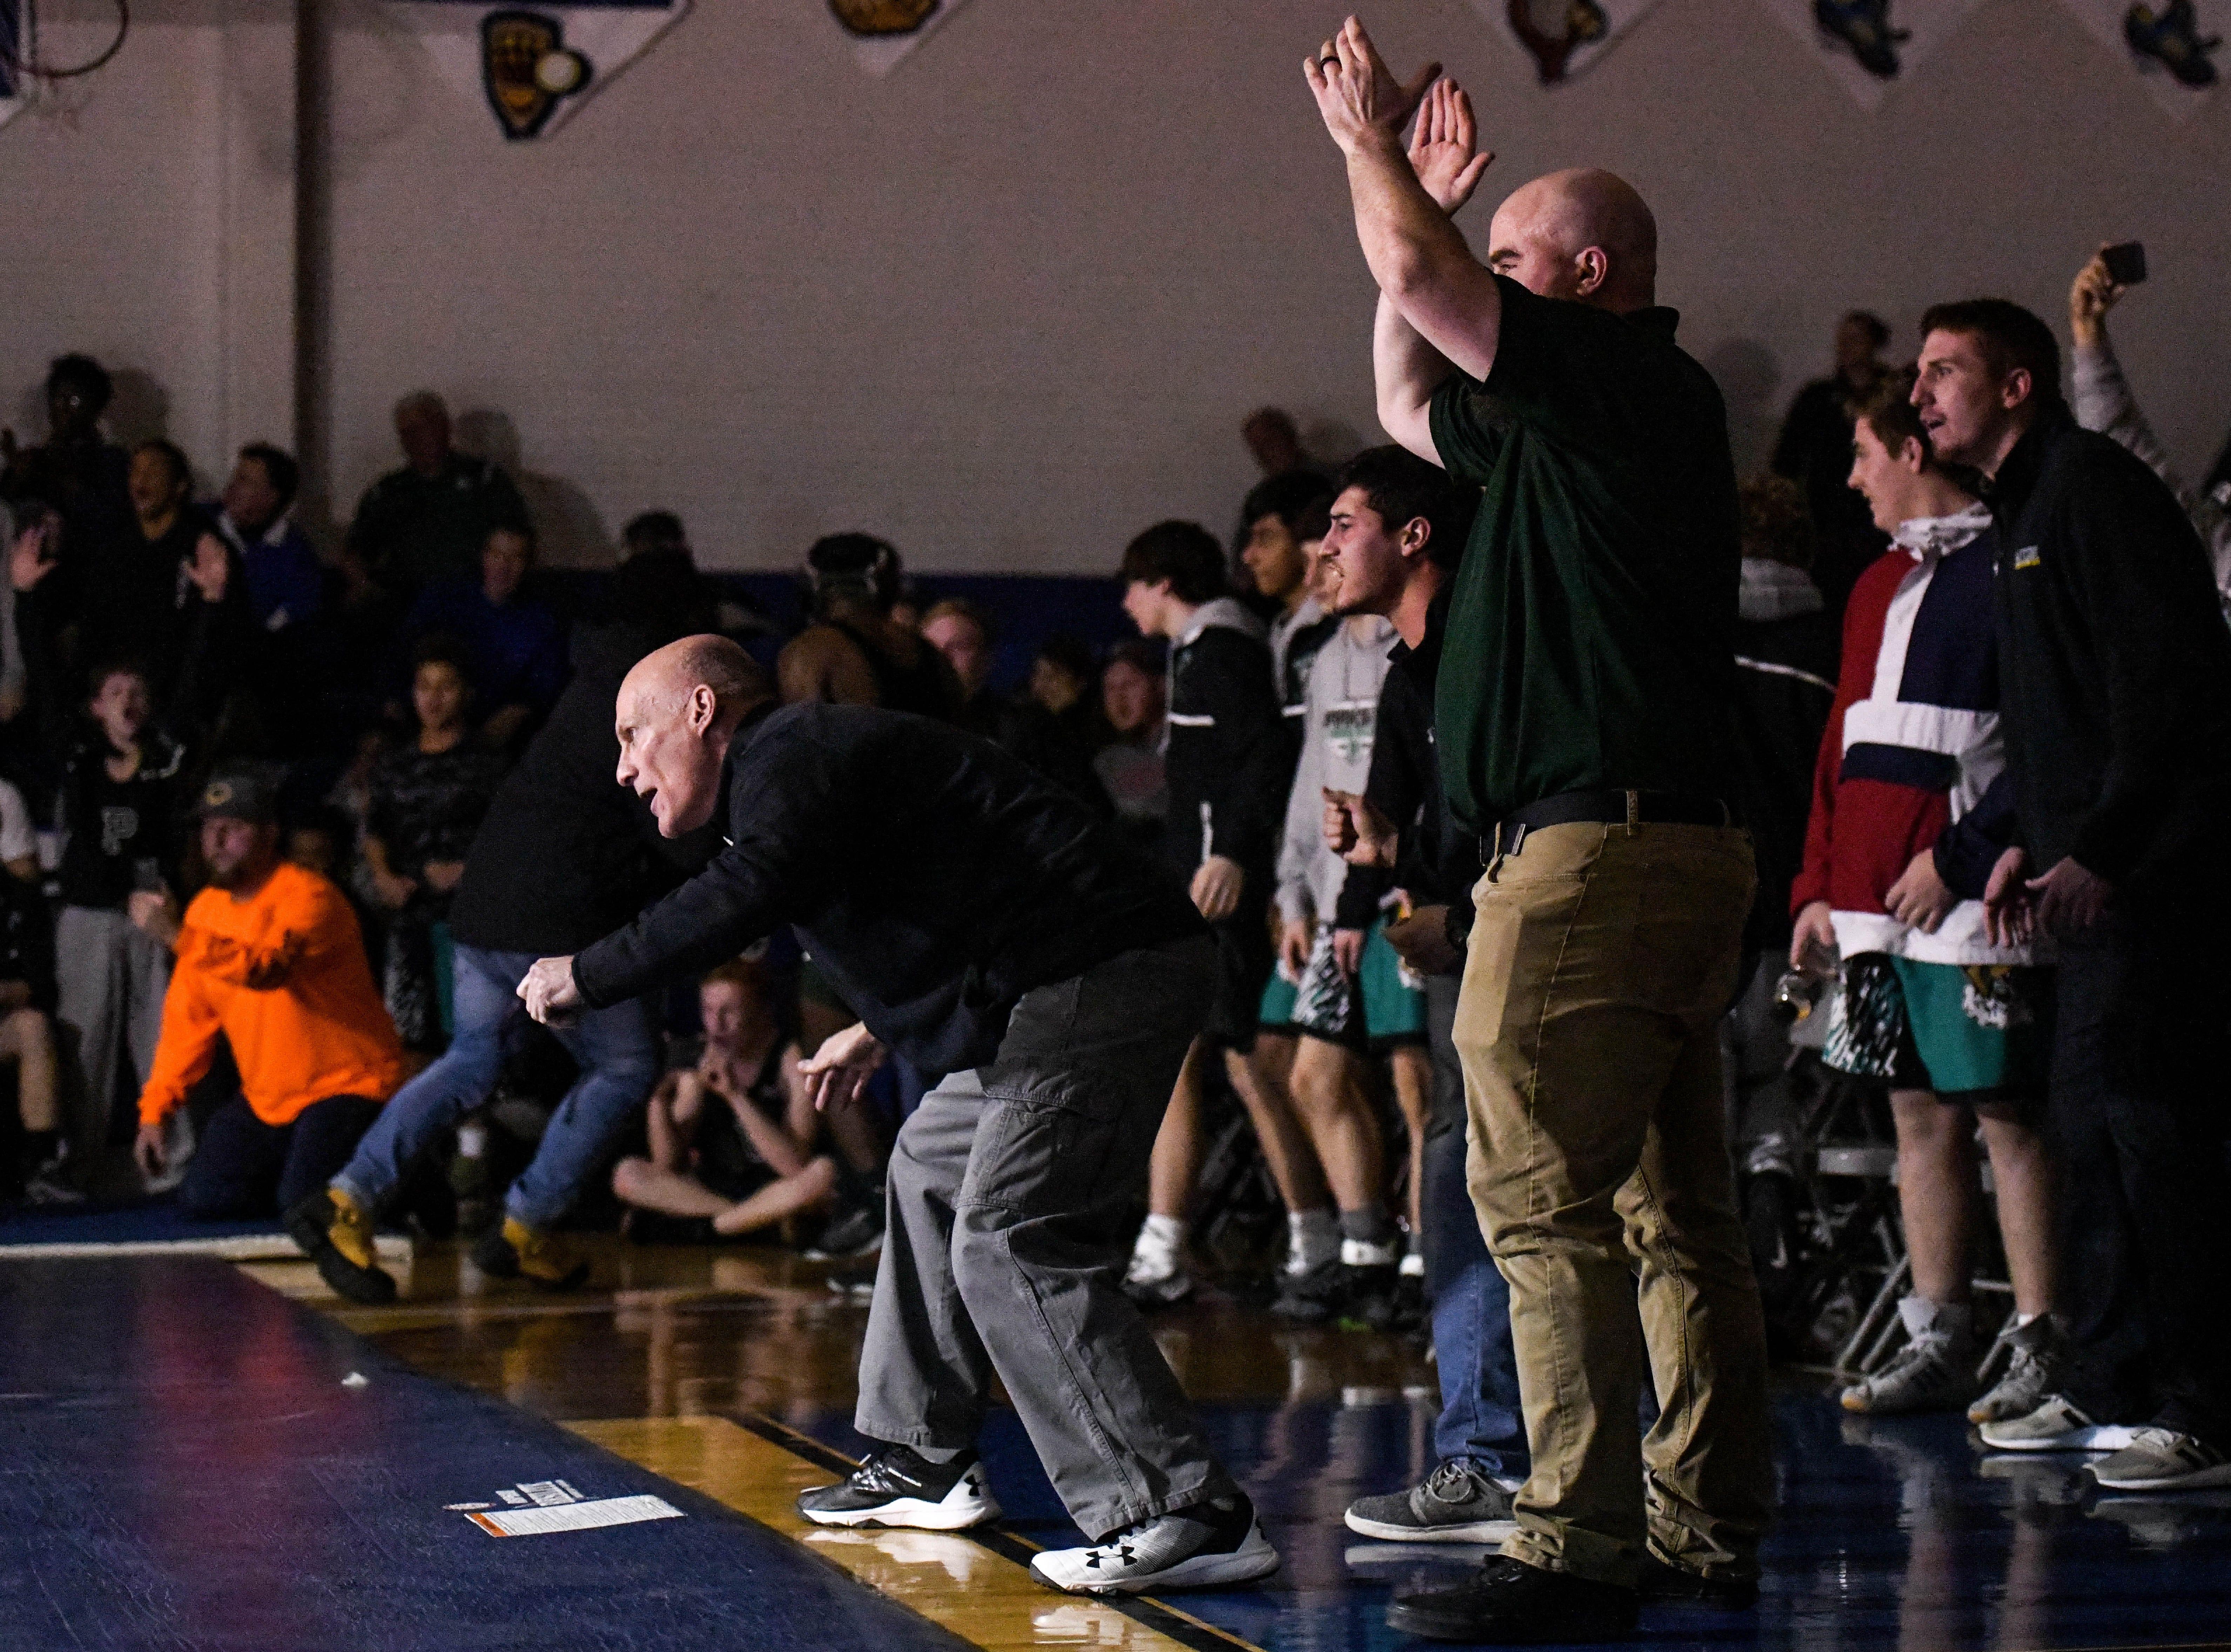 Parkside's Burt Cashman coaches the team at a match at Stephen Decatur High School on Wednesday, Jan. 23, 2019.